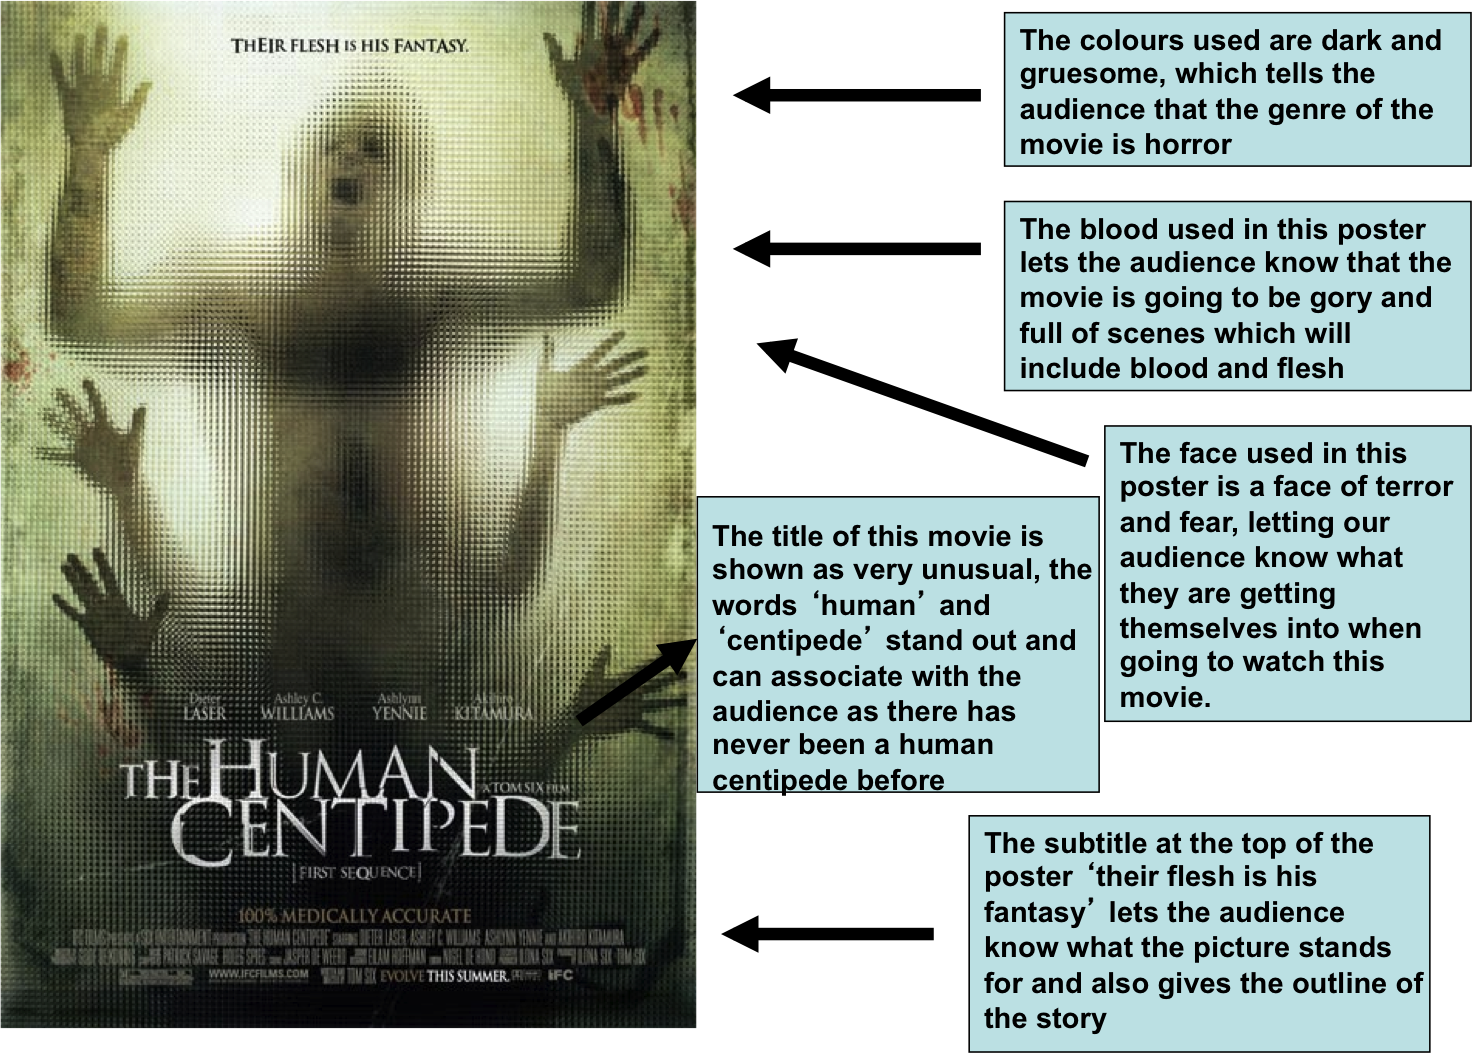 media film poster analysis